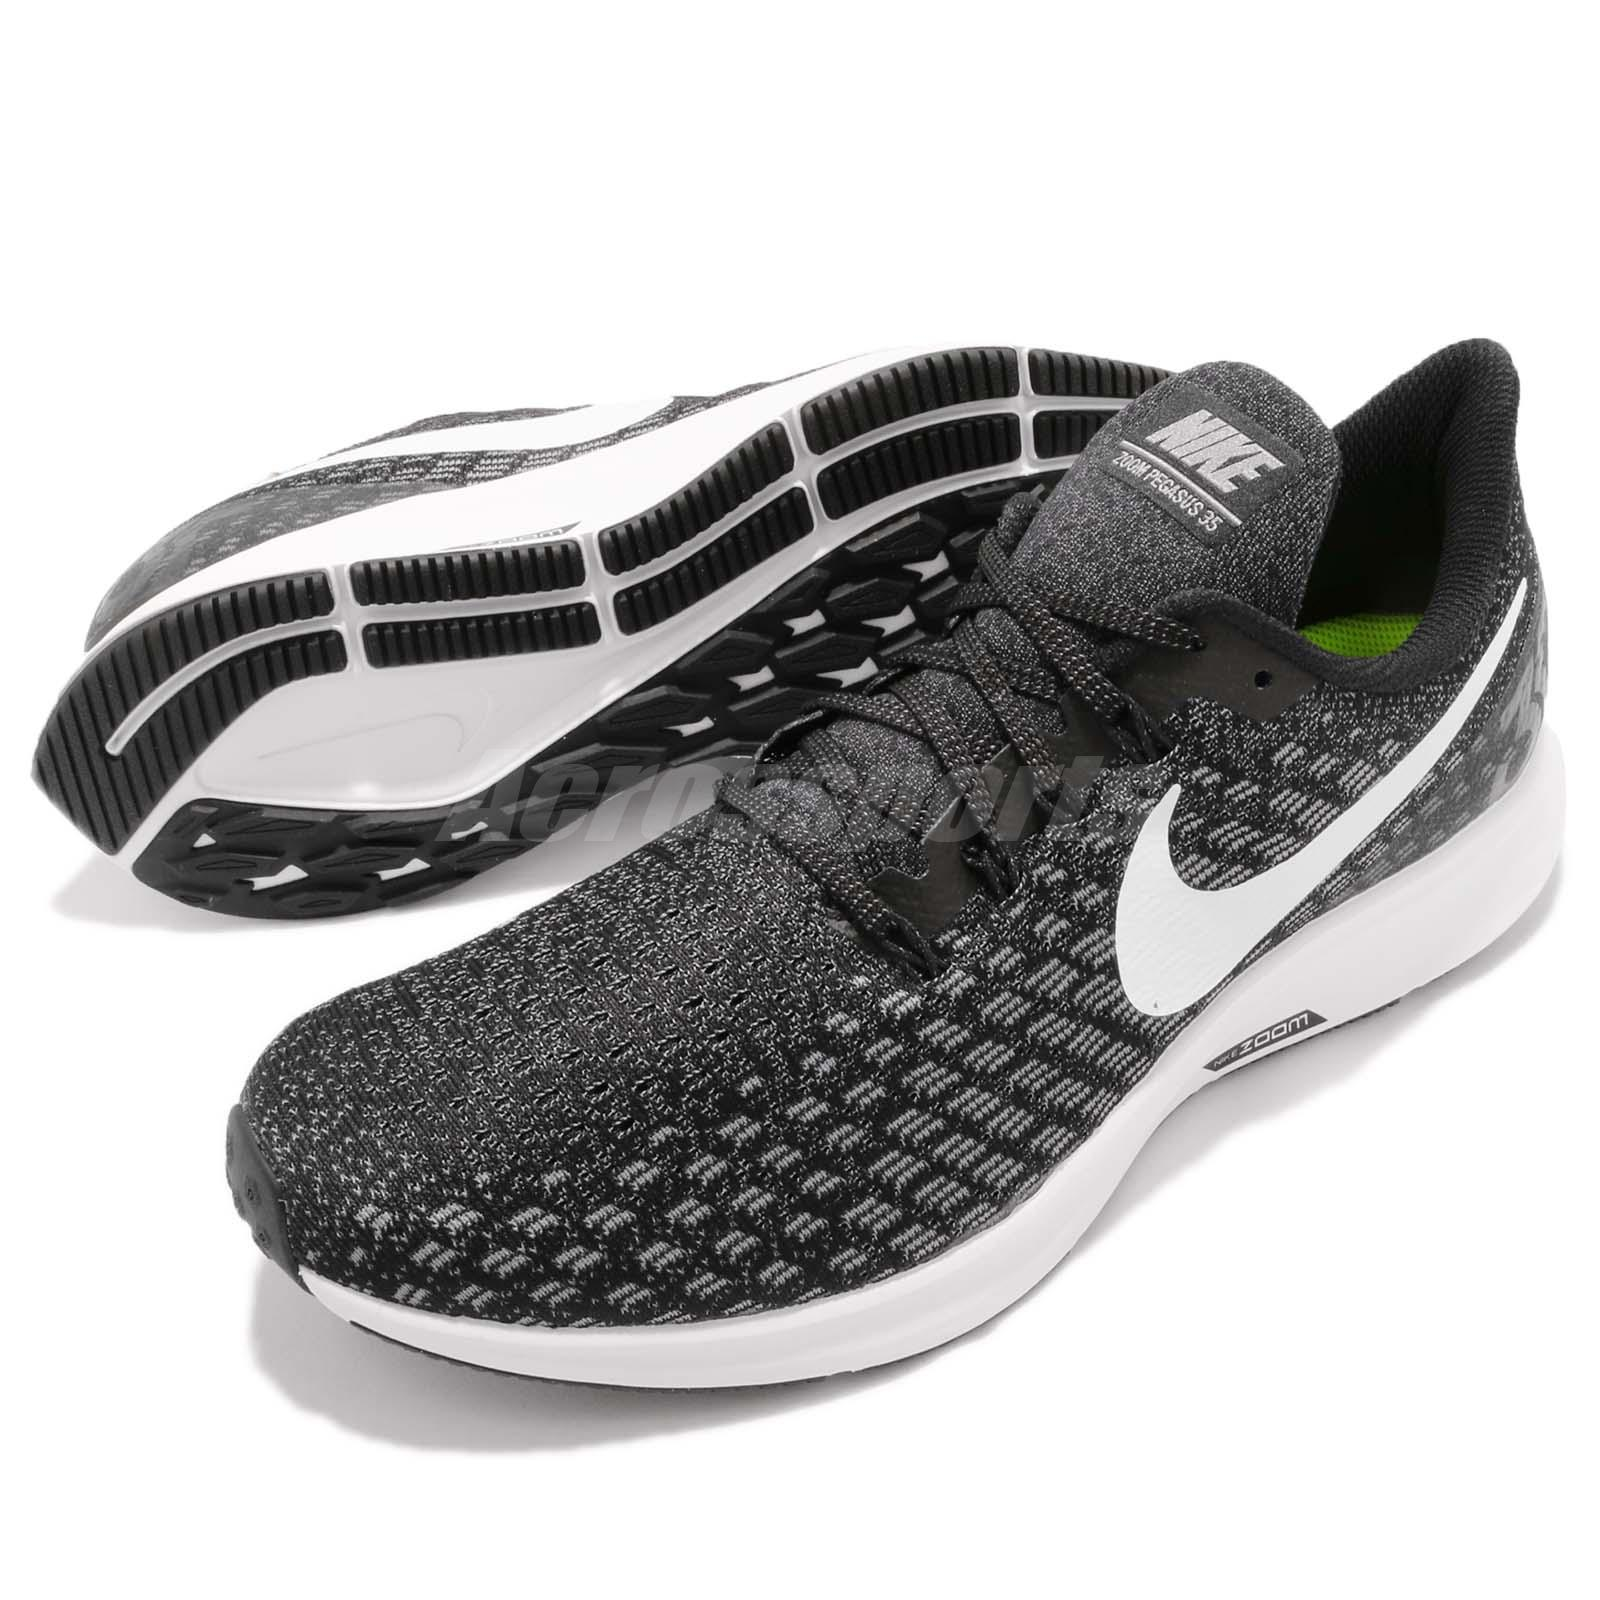 Nike Air Zoom Pegasus 35 Black White Grey Men Running Shoes Sneakers ... 154c273ca